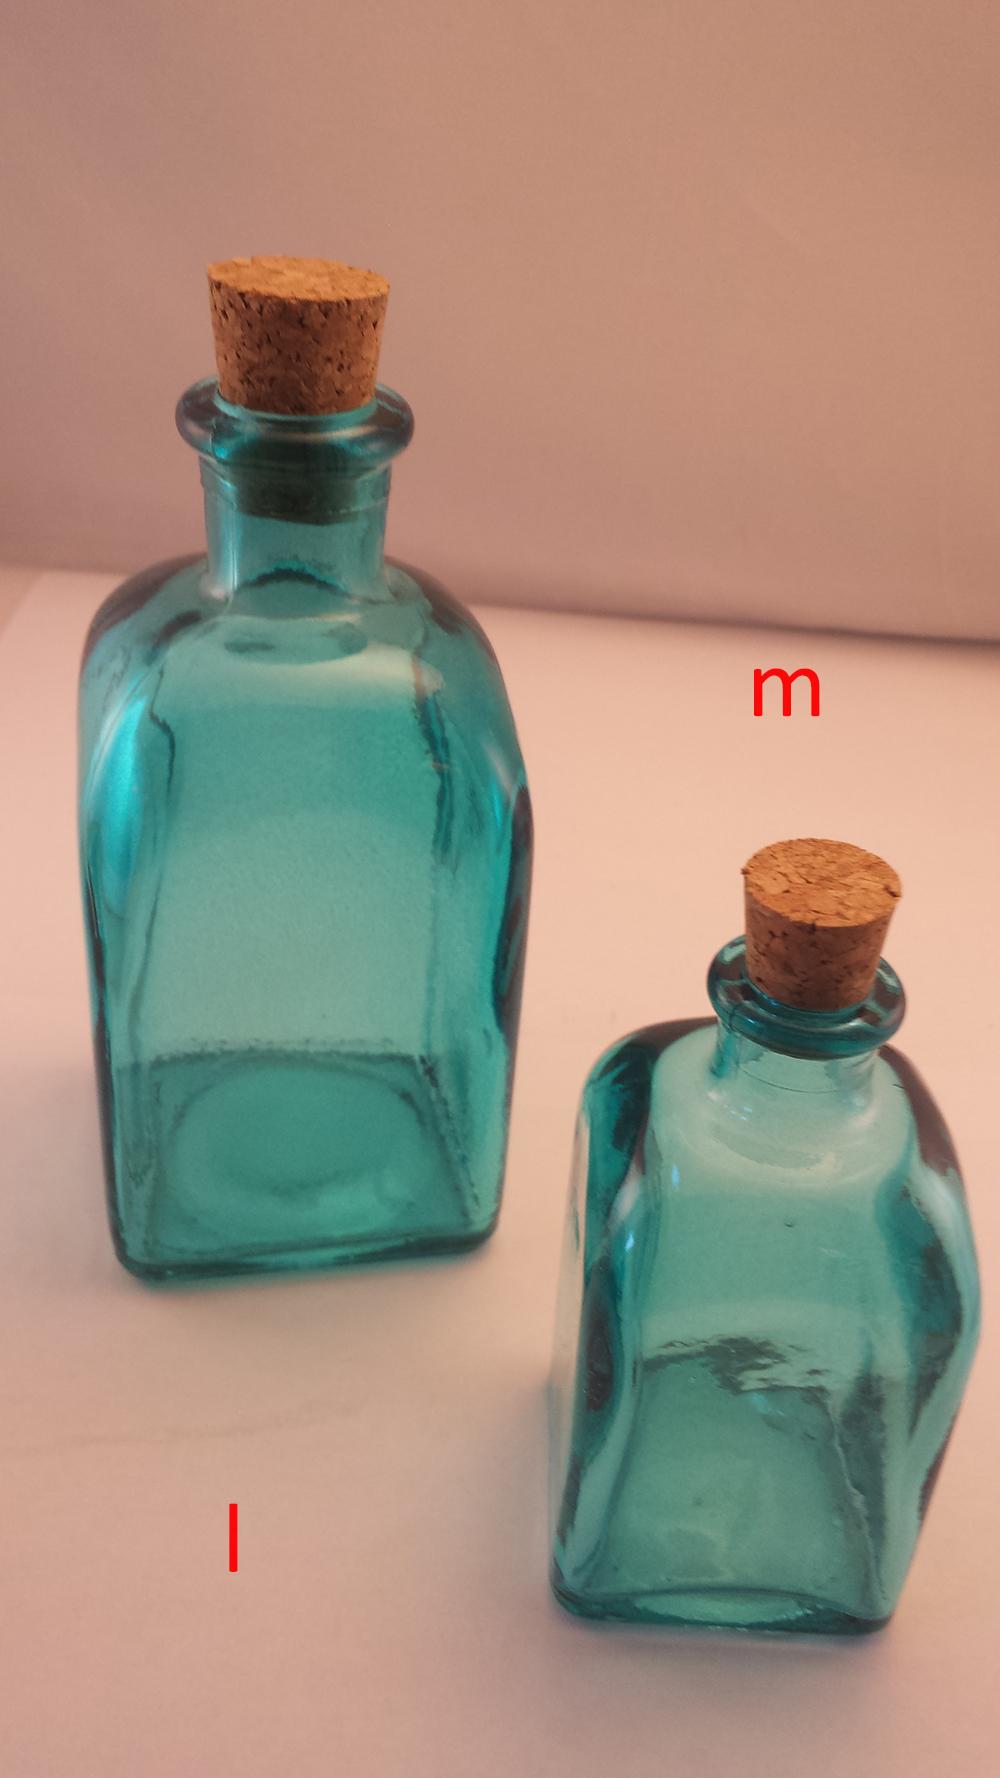 cork bottle6.jpg